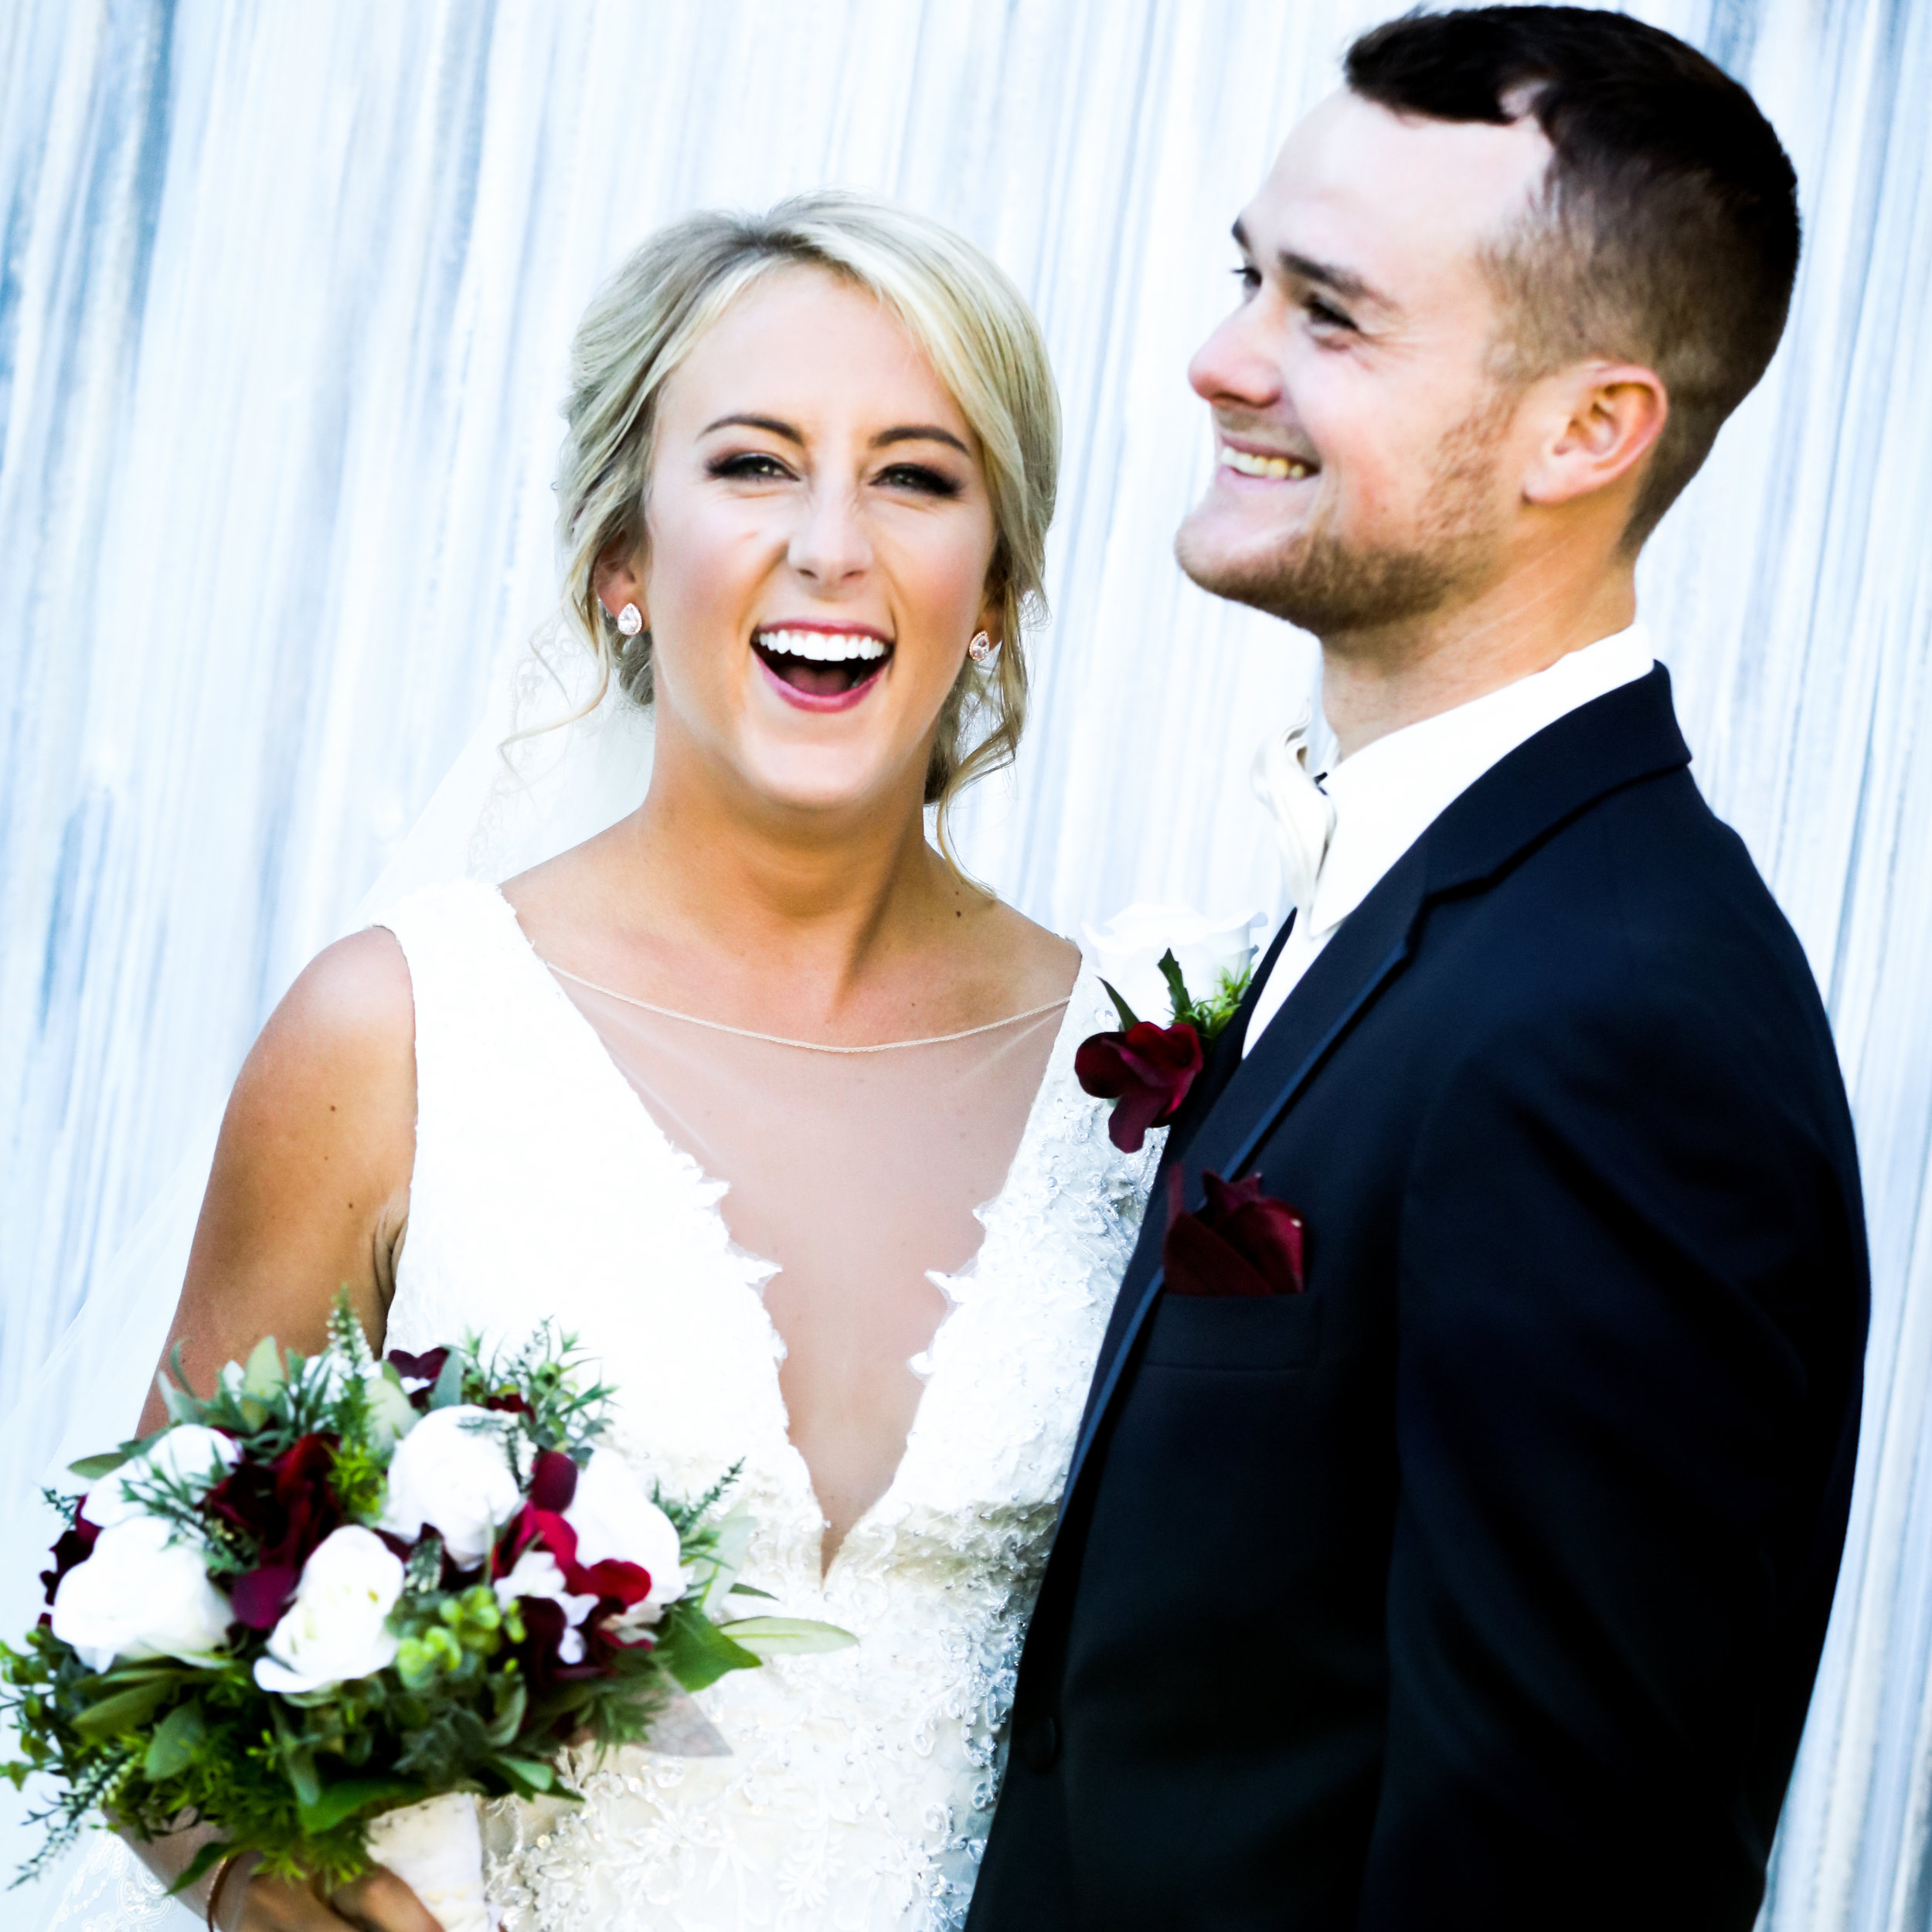 WeddingWebsite-76.jpg